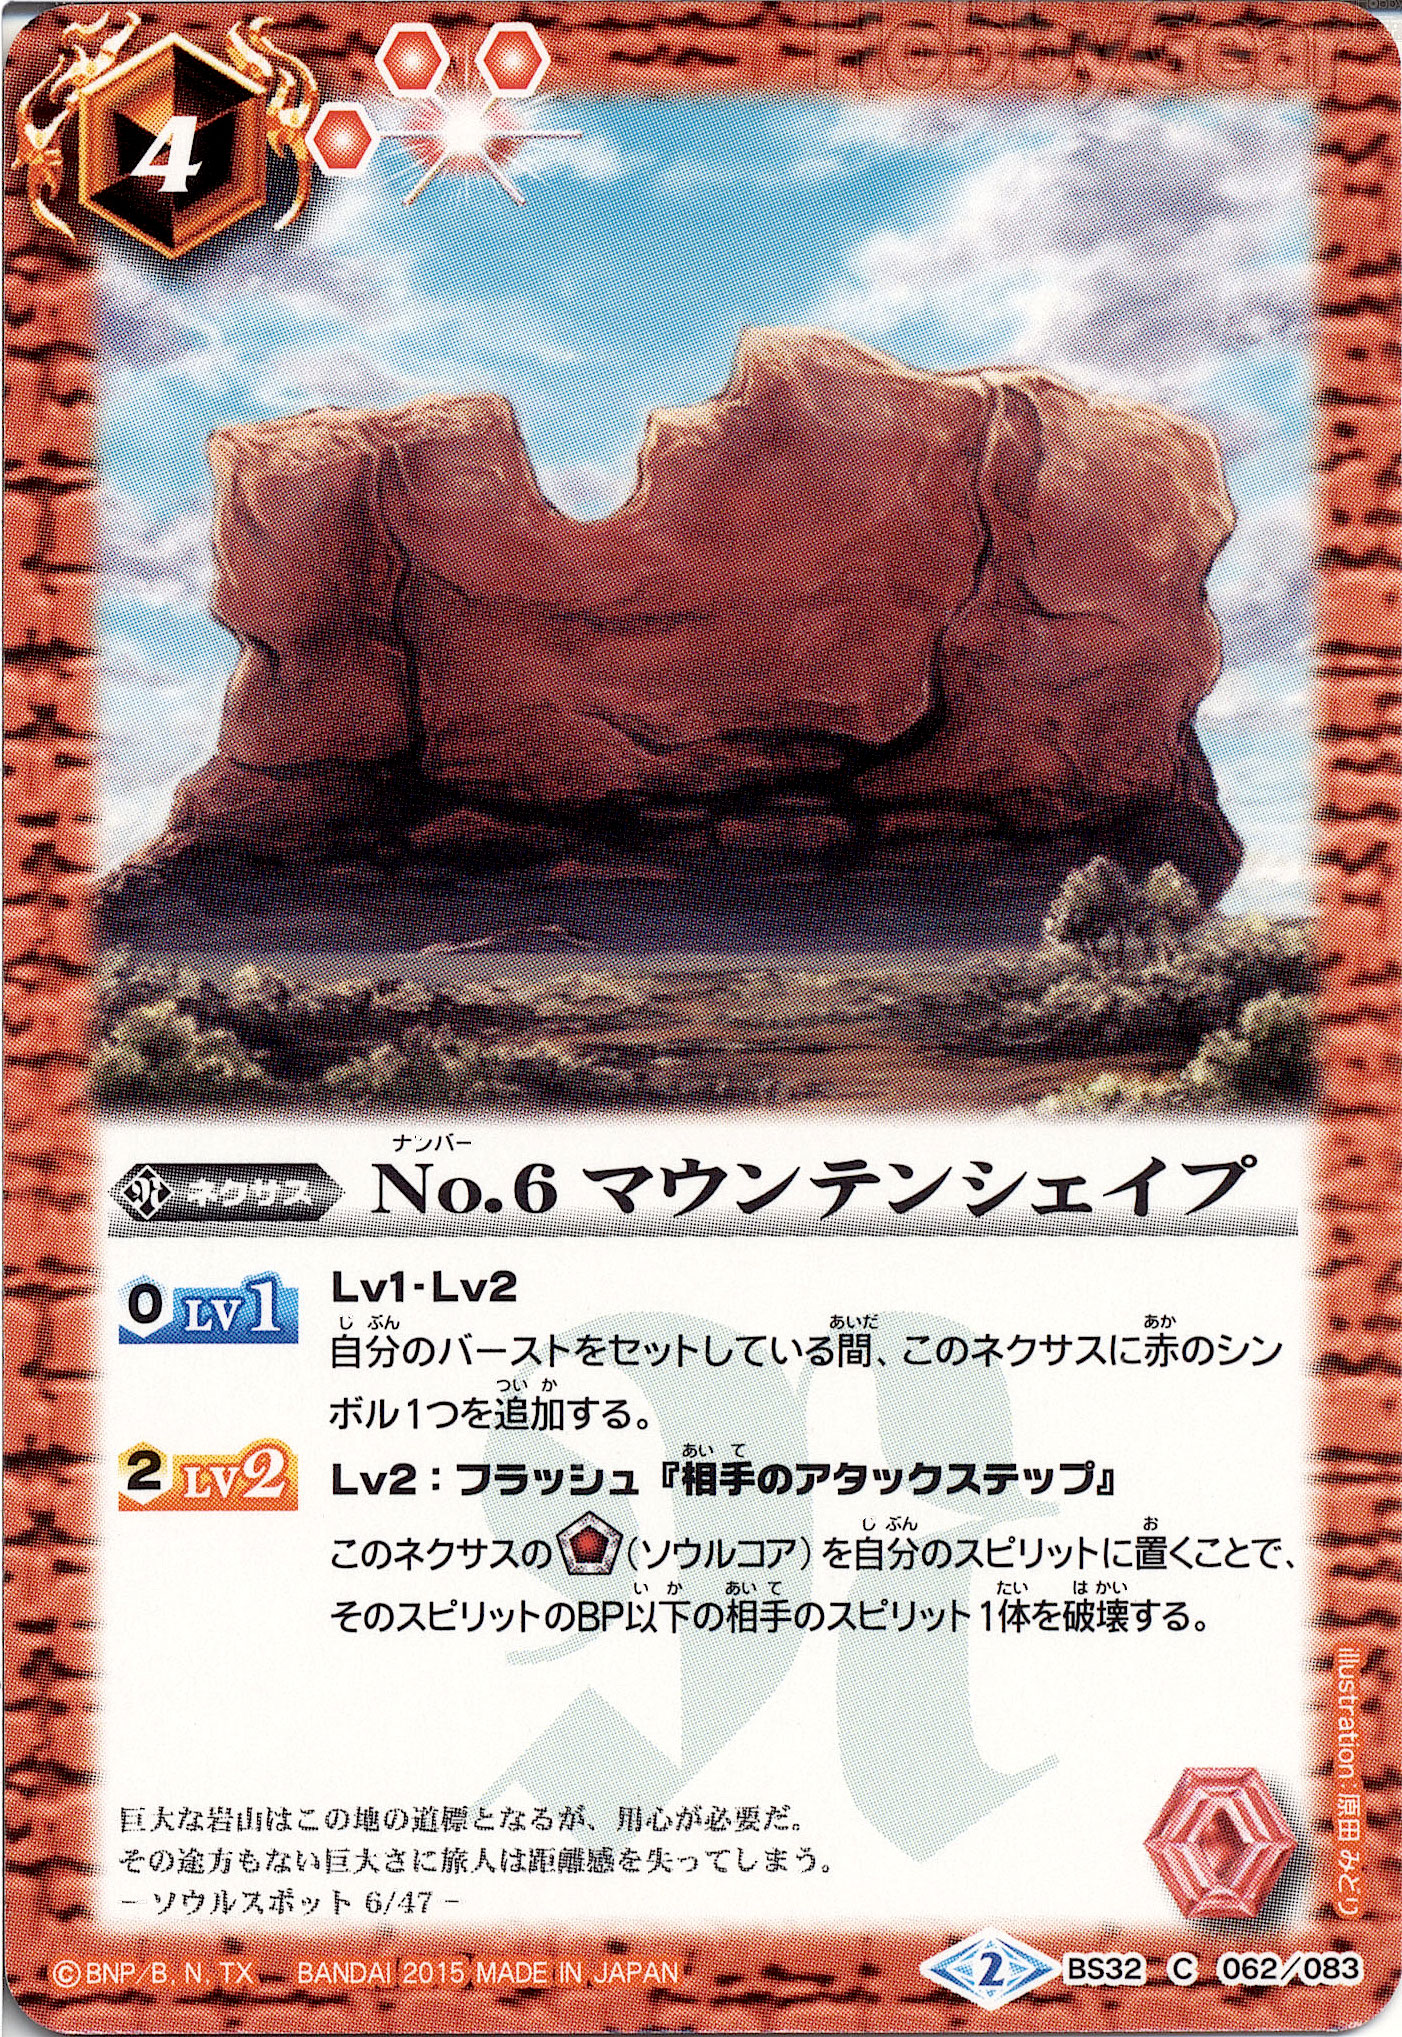 No. 6 Mountain Shape